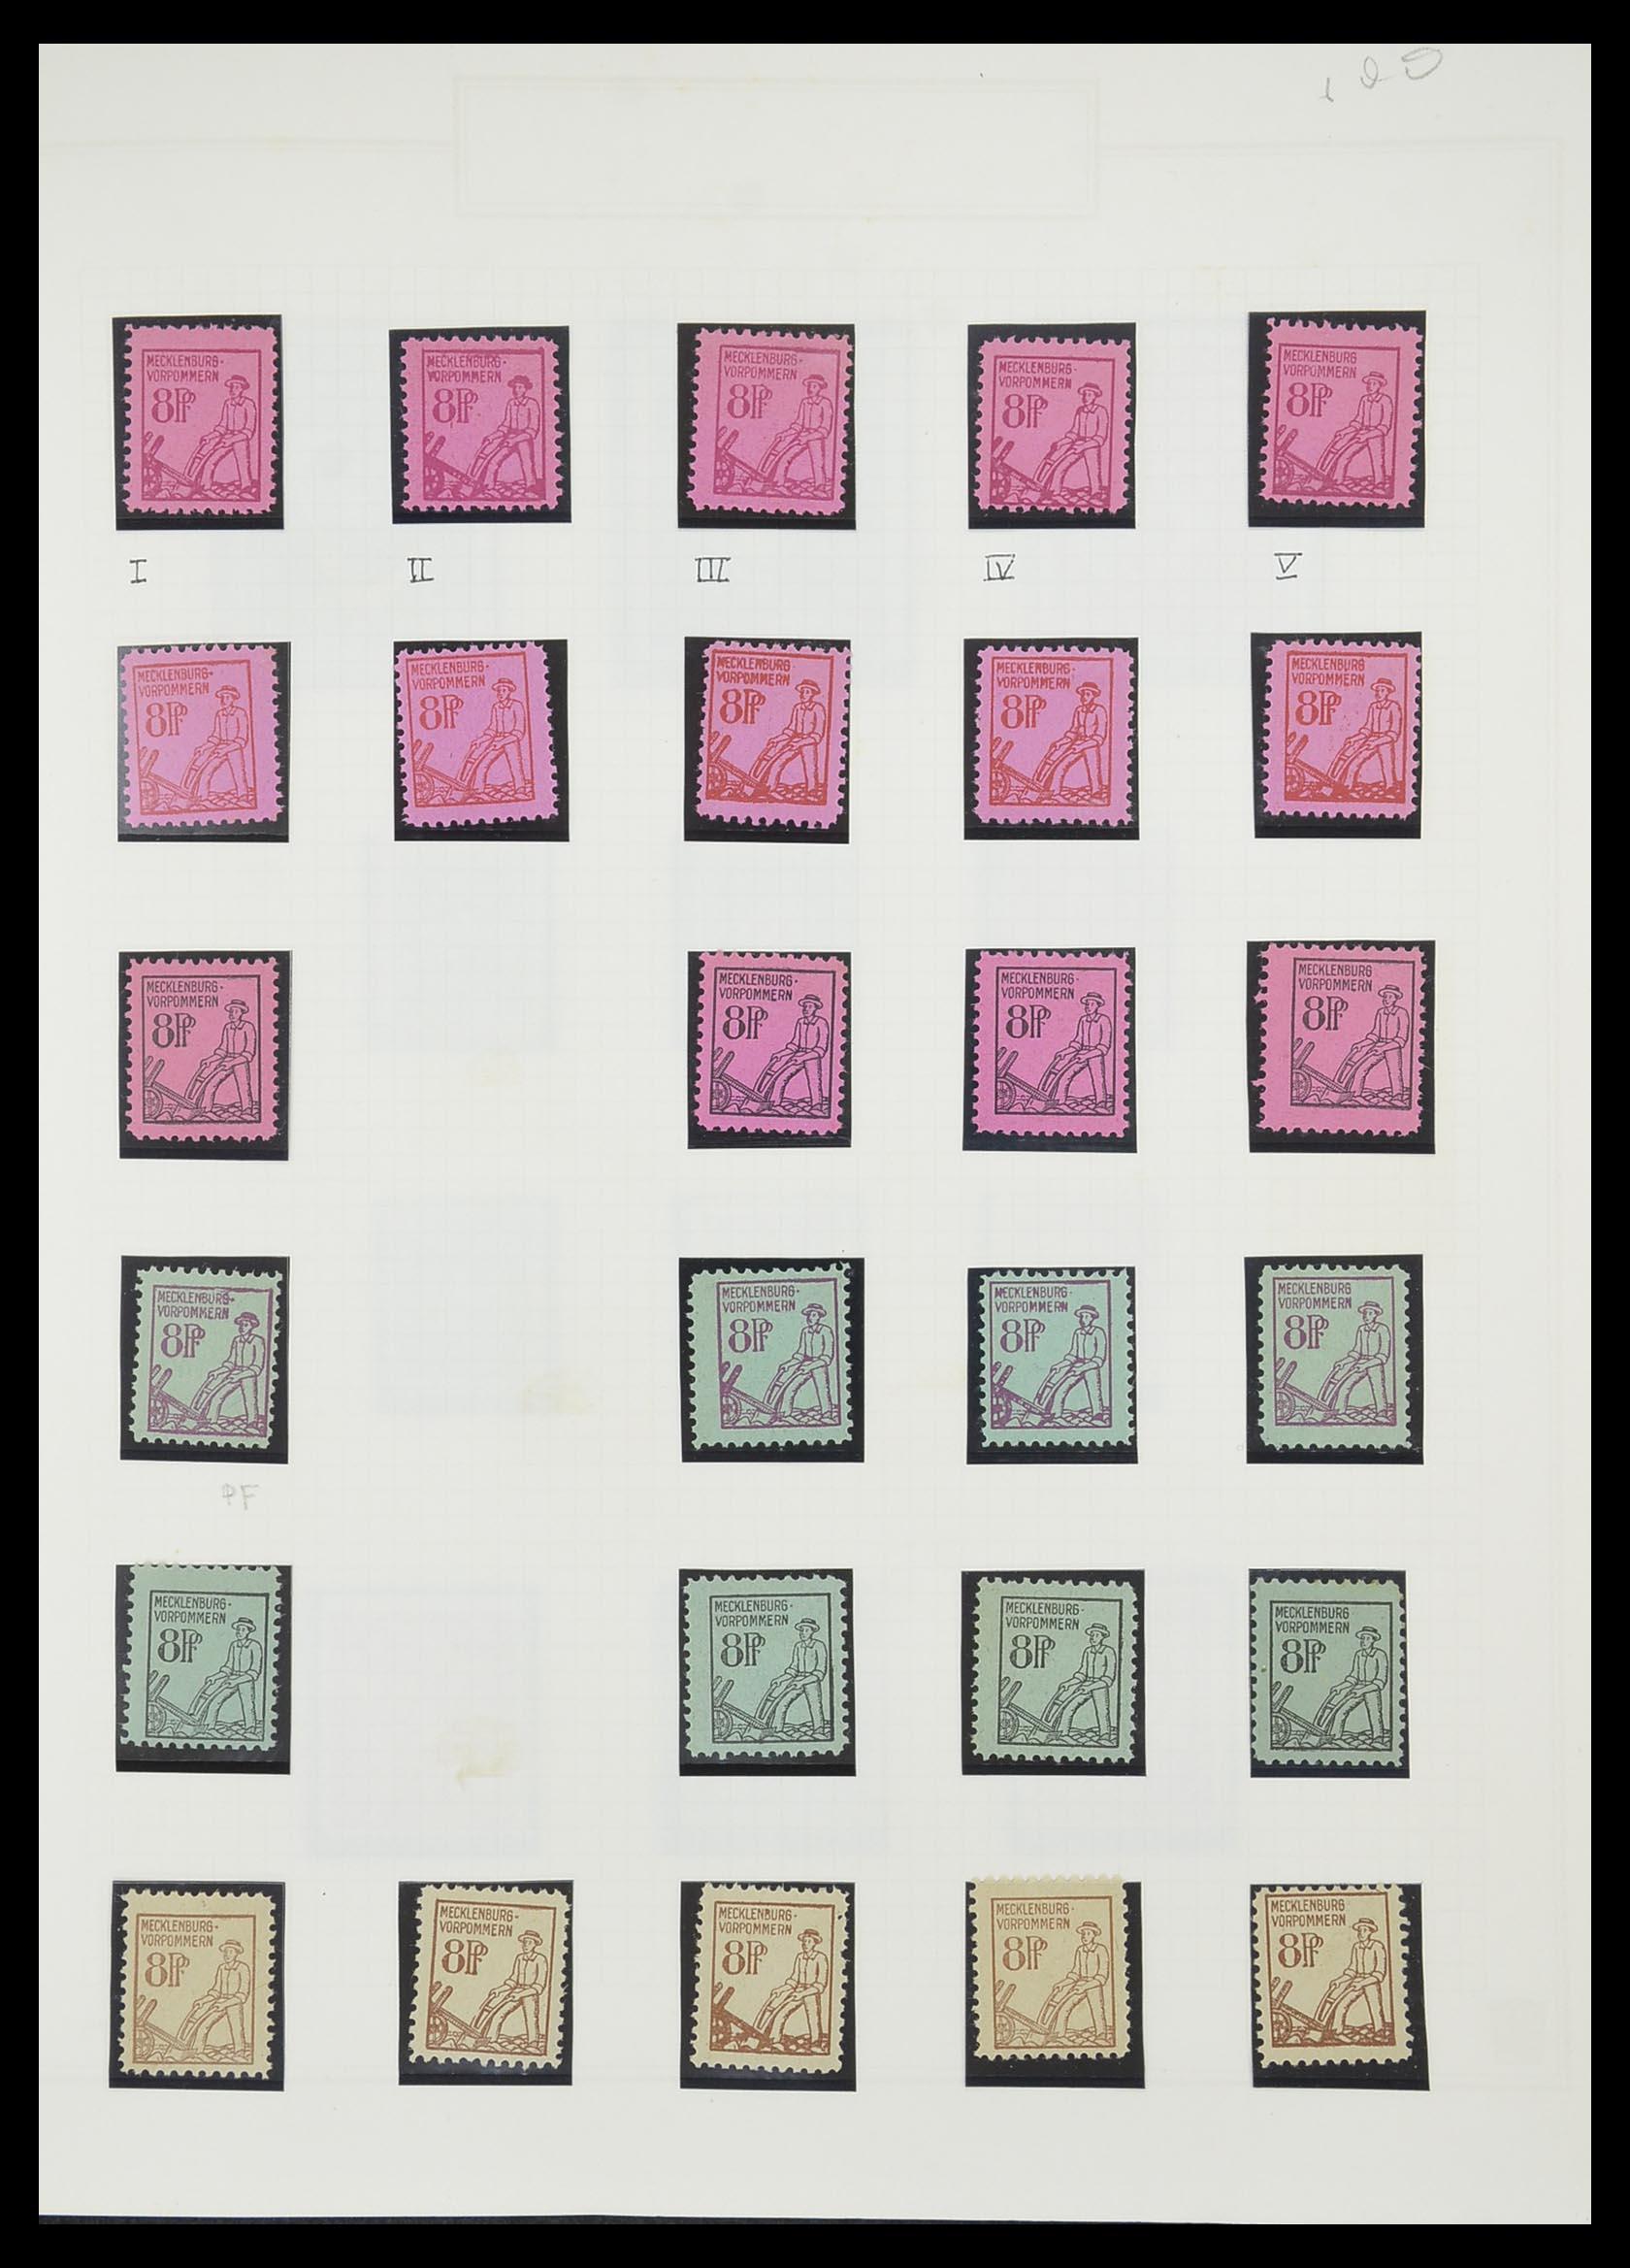 33698 012 - Postzegelverzameling 33698 Sovjet Zone 1945-1948.